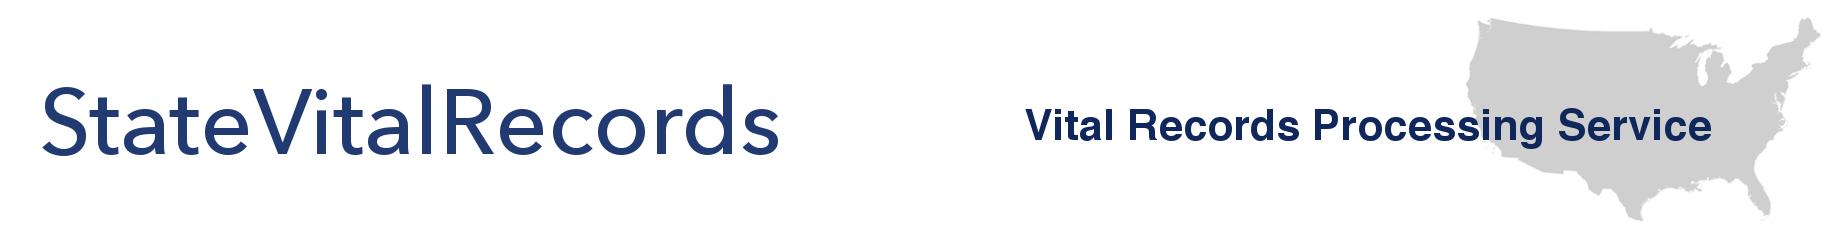 State Vital Records - Vital Records Processing Service